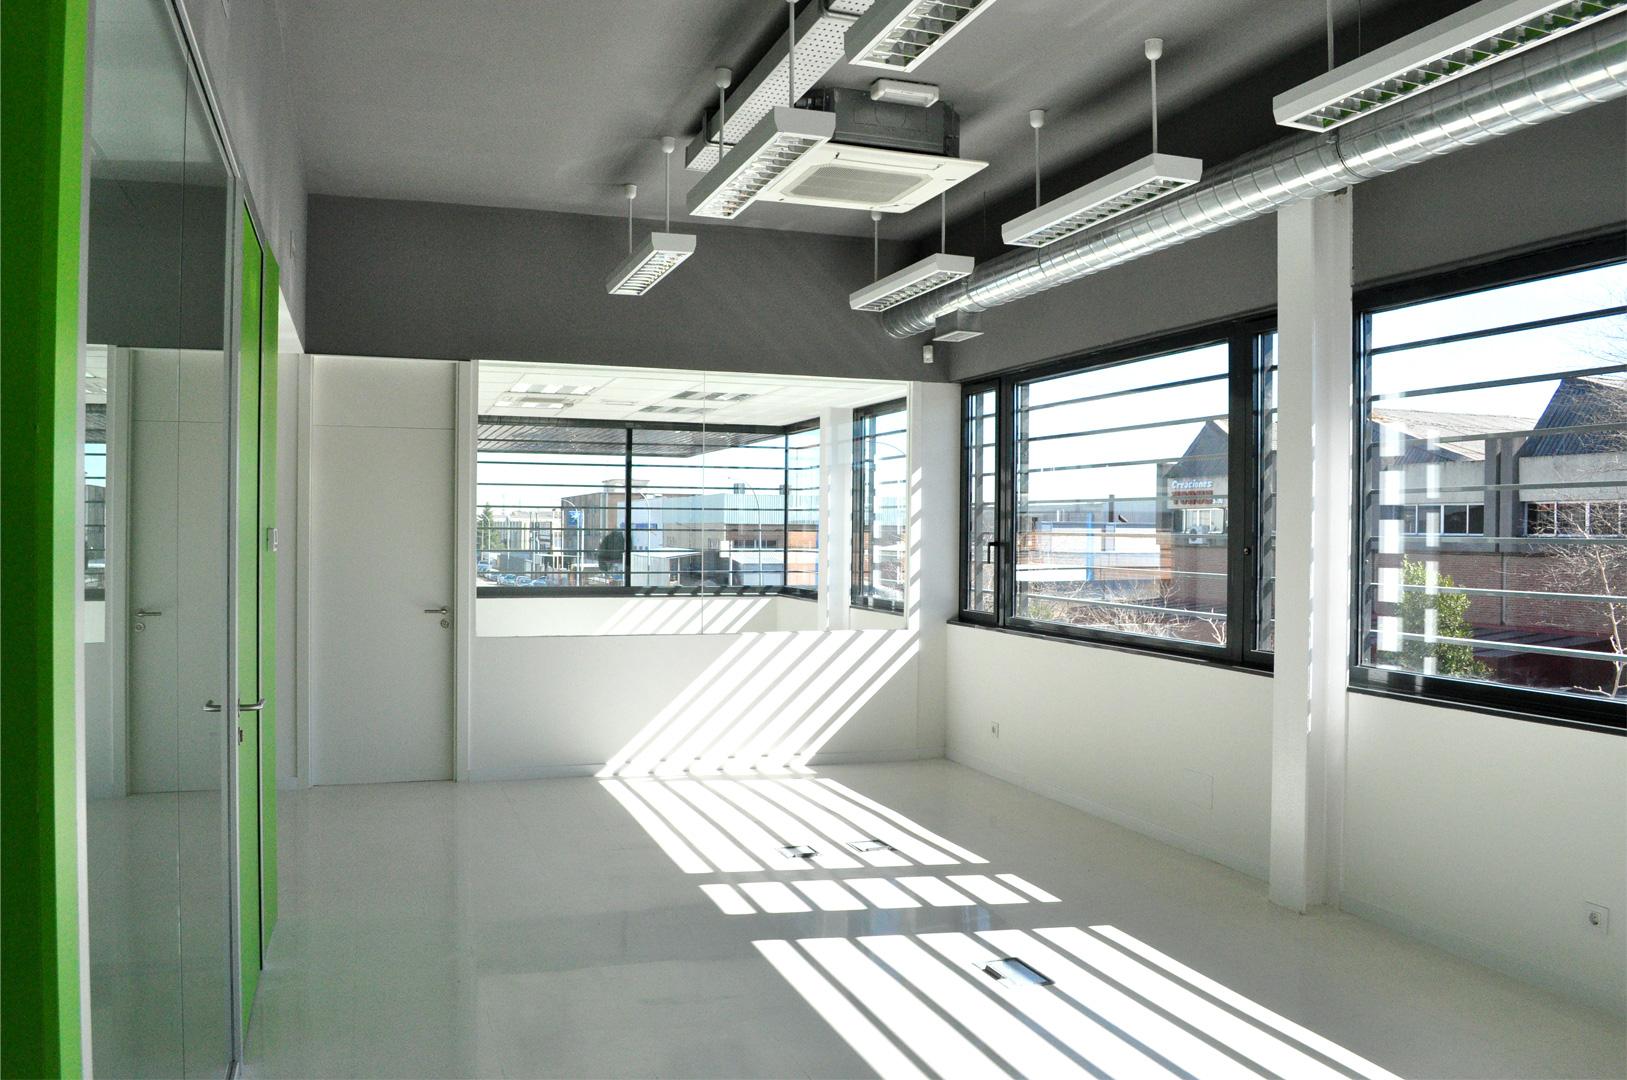 Ampliacion de nave para uso de oficinas alcorcon madrid for Oficina adecco alcorcon